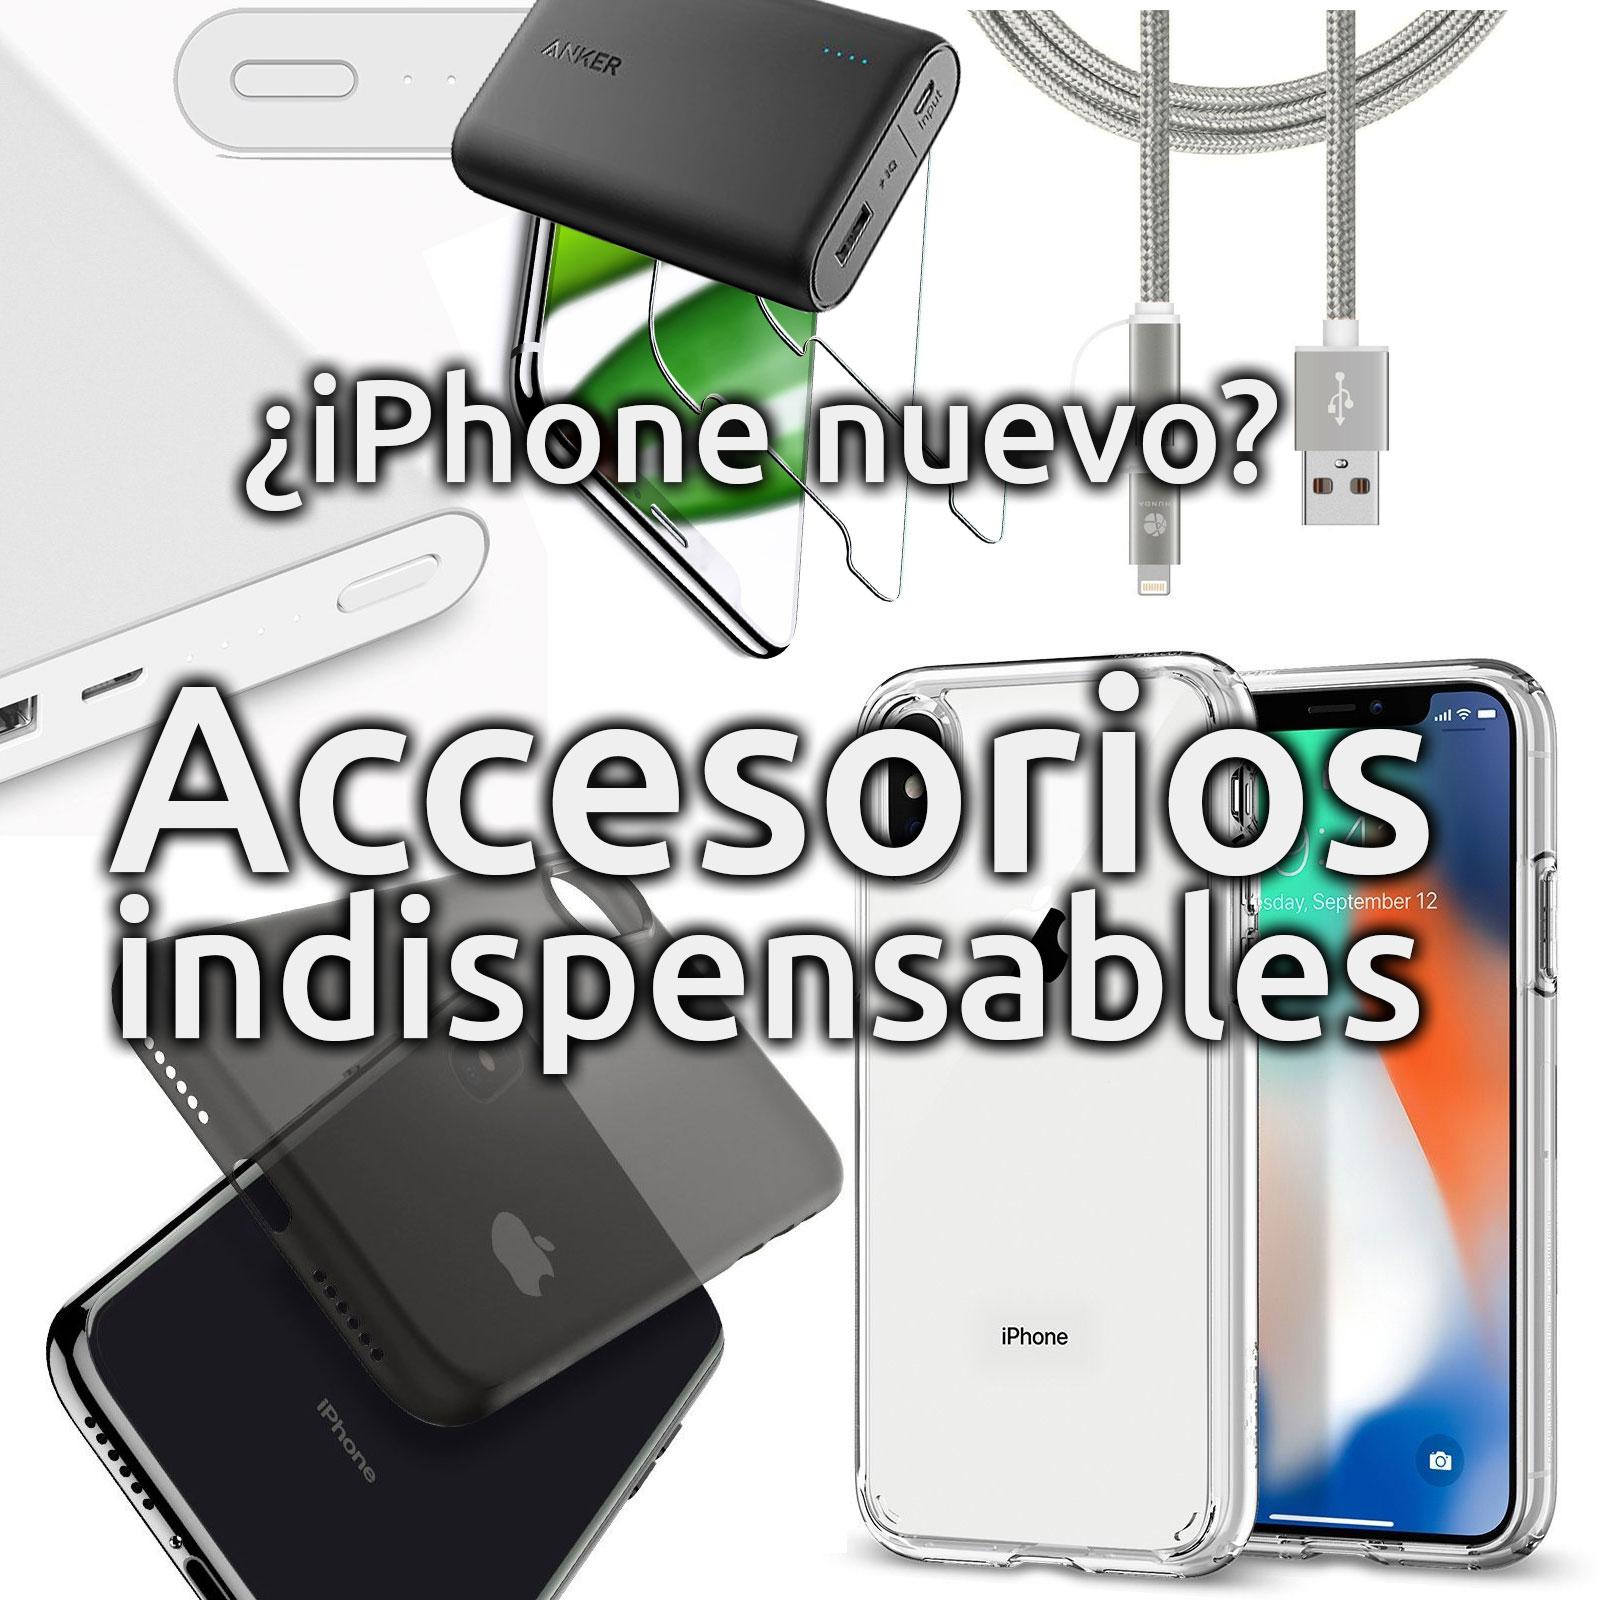 ¿iPhone nuevo? Accesorios indispensables